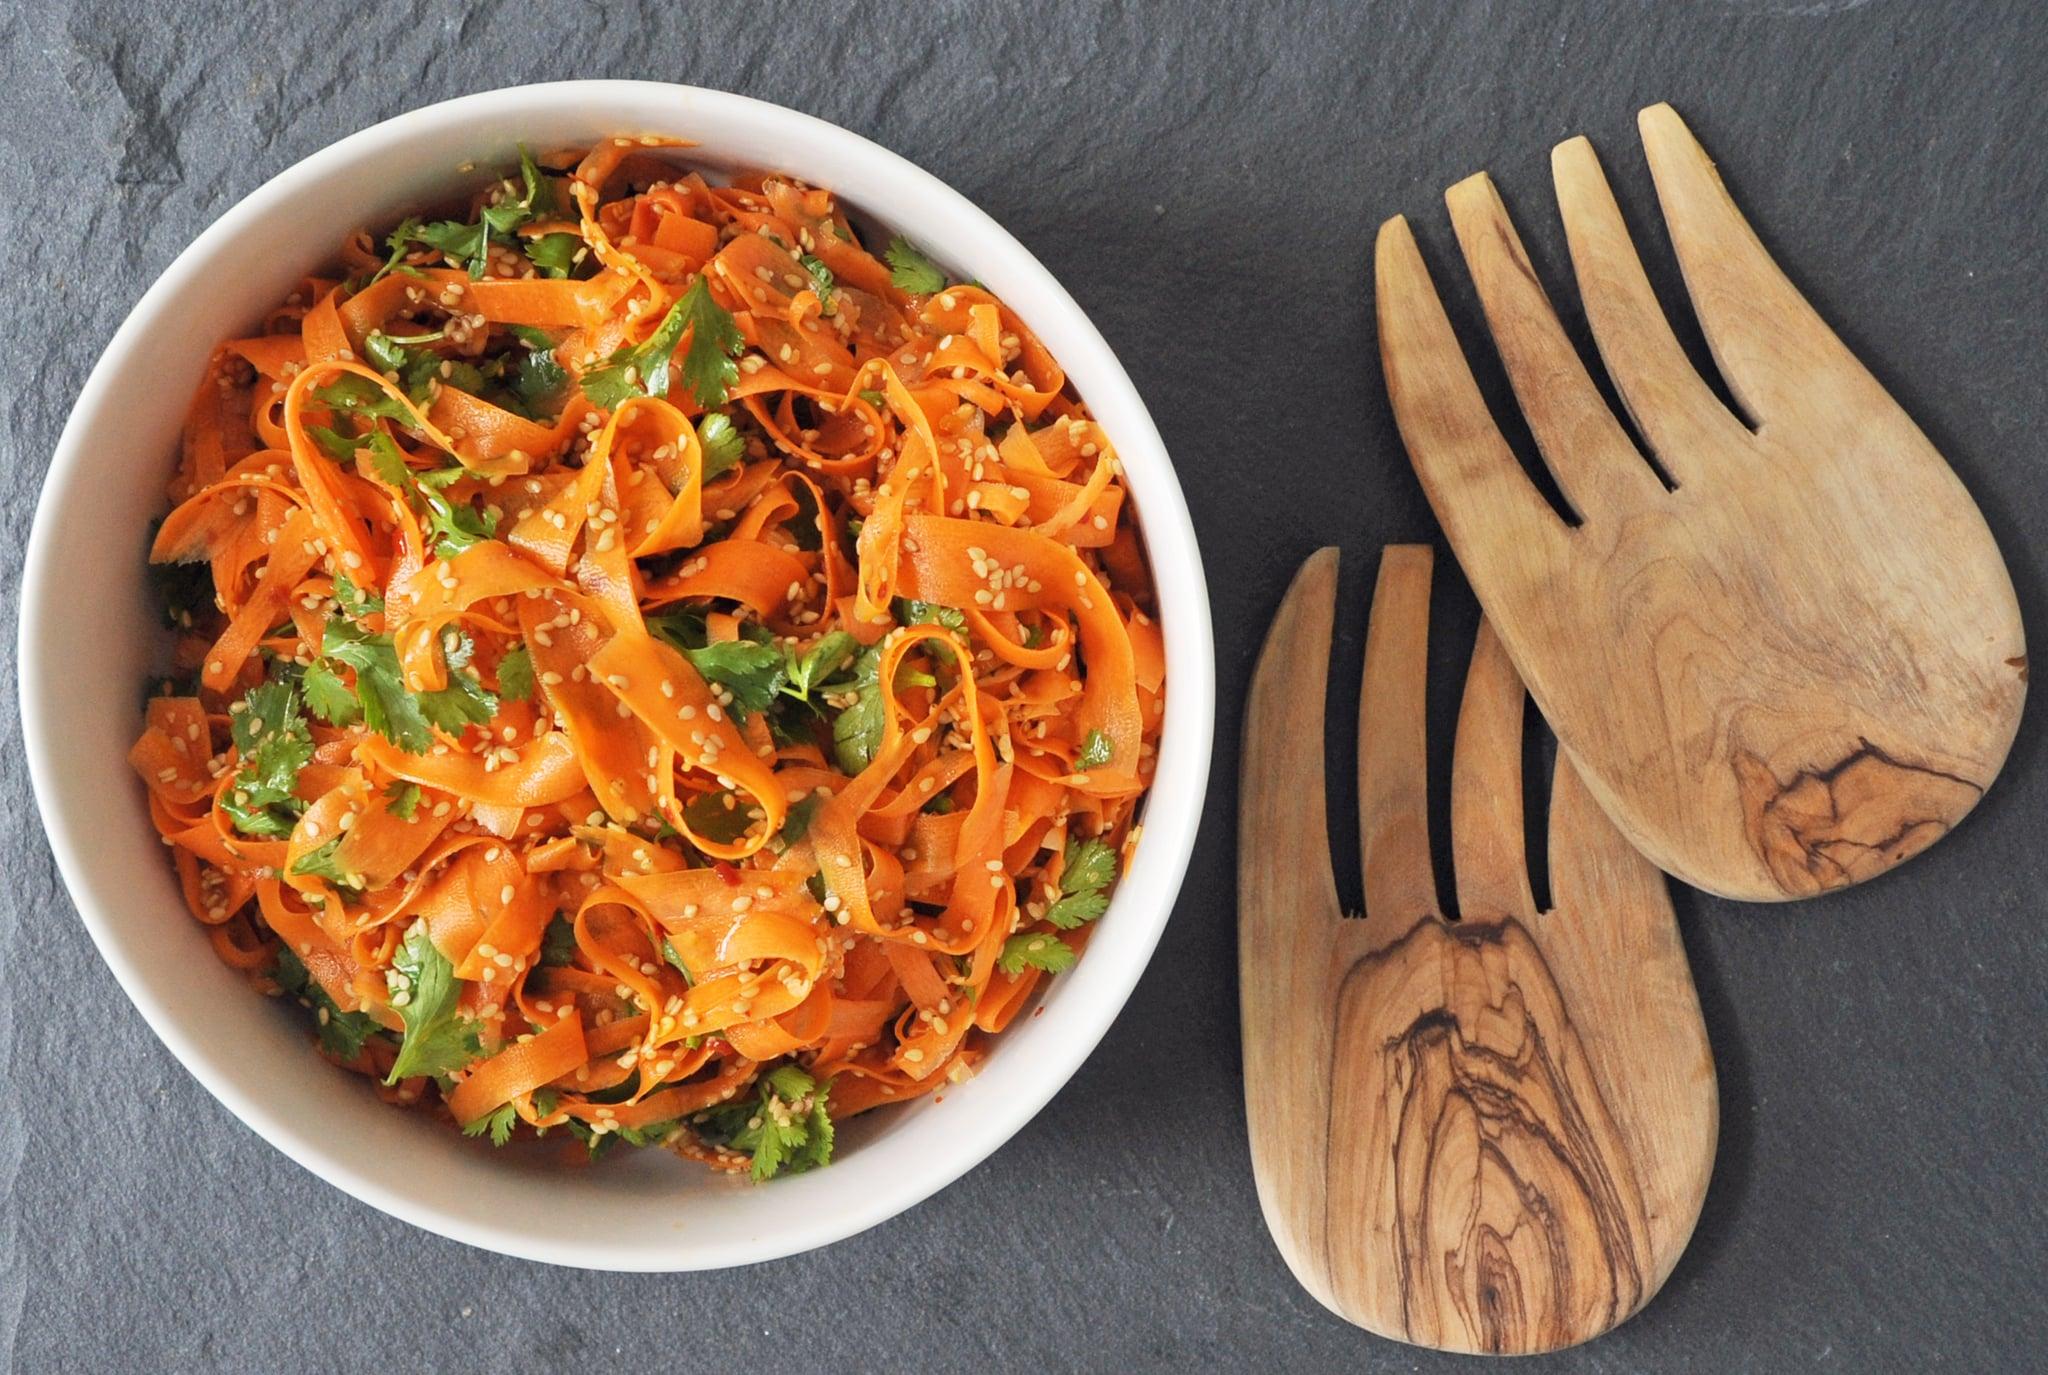 Sesame-Carrot Salad